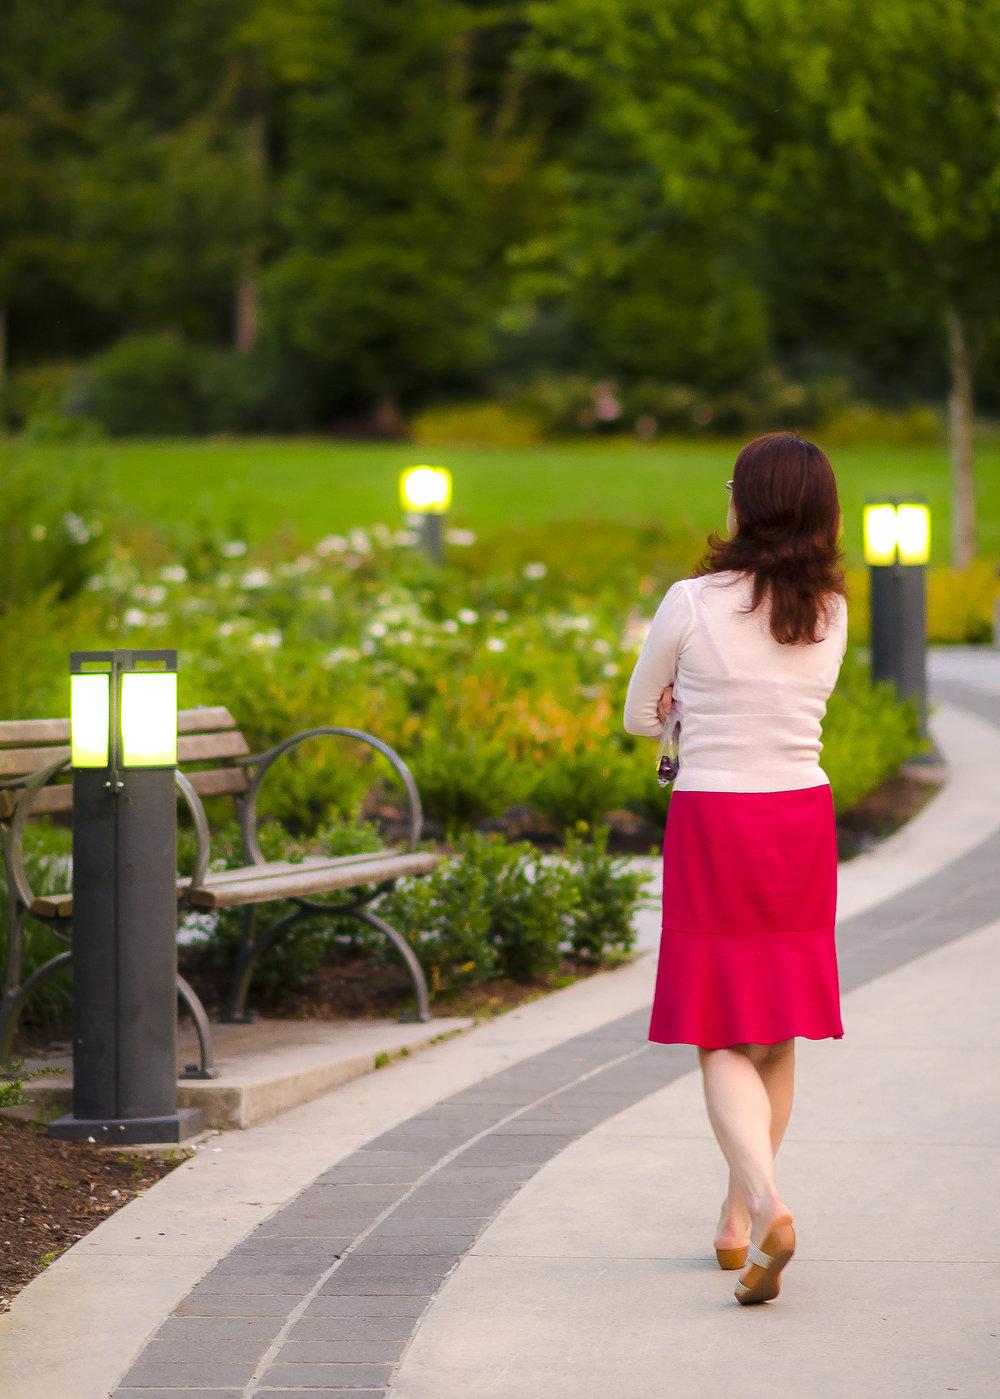 UBC Wesbrook Village Khorana Park pathway